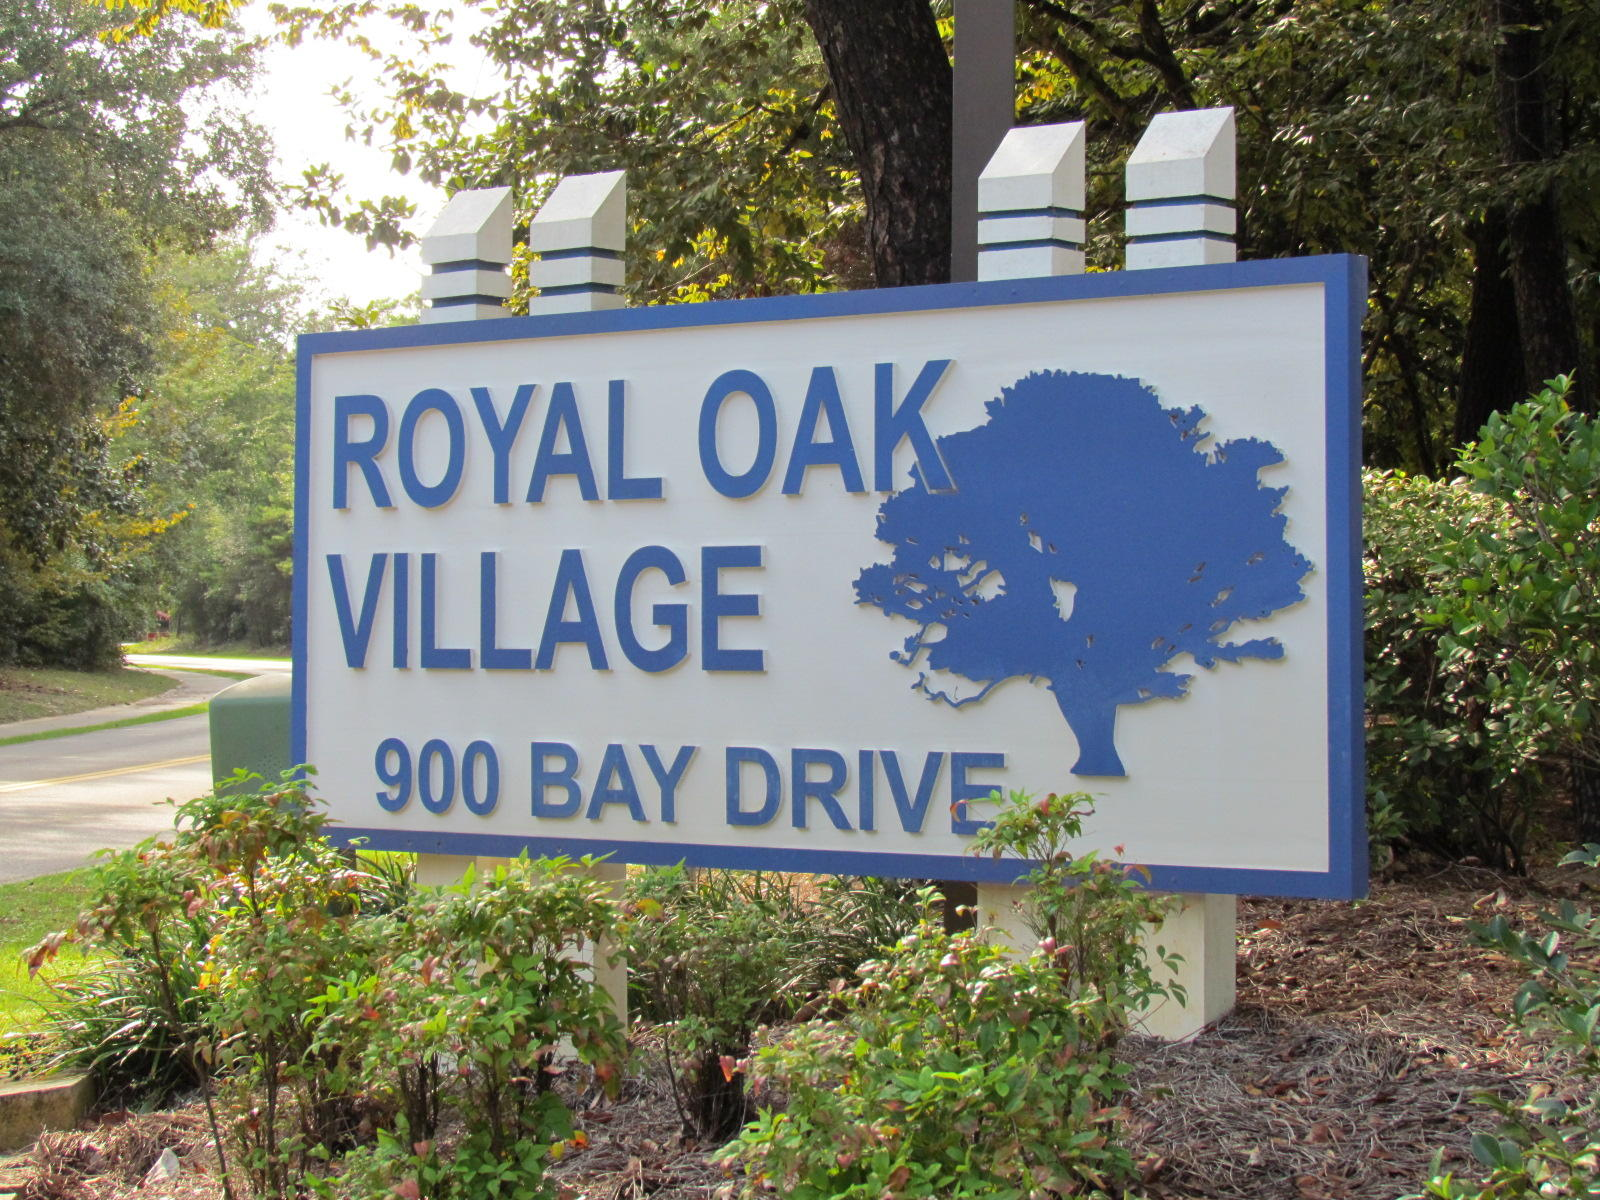 A 2 Bedroom 2 Bedroom Royal Oak Village Rental